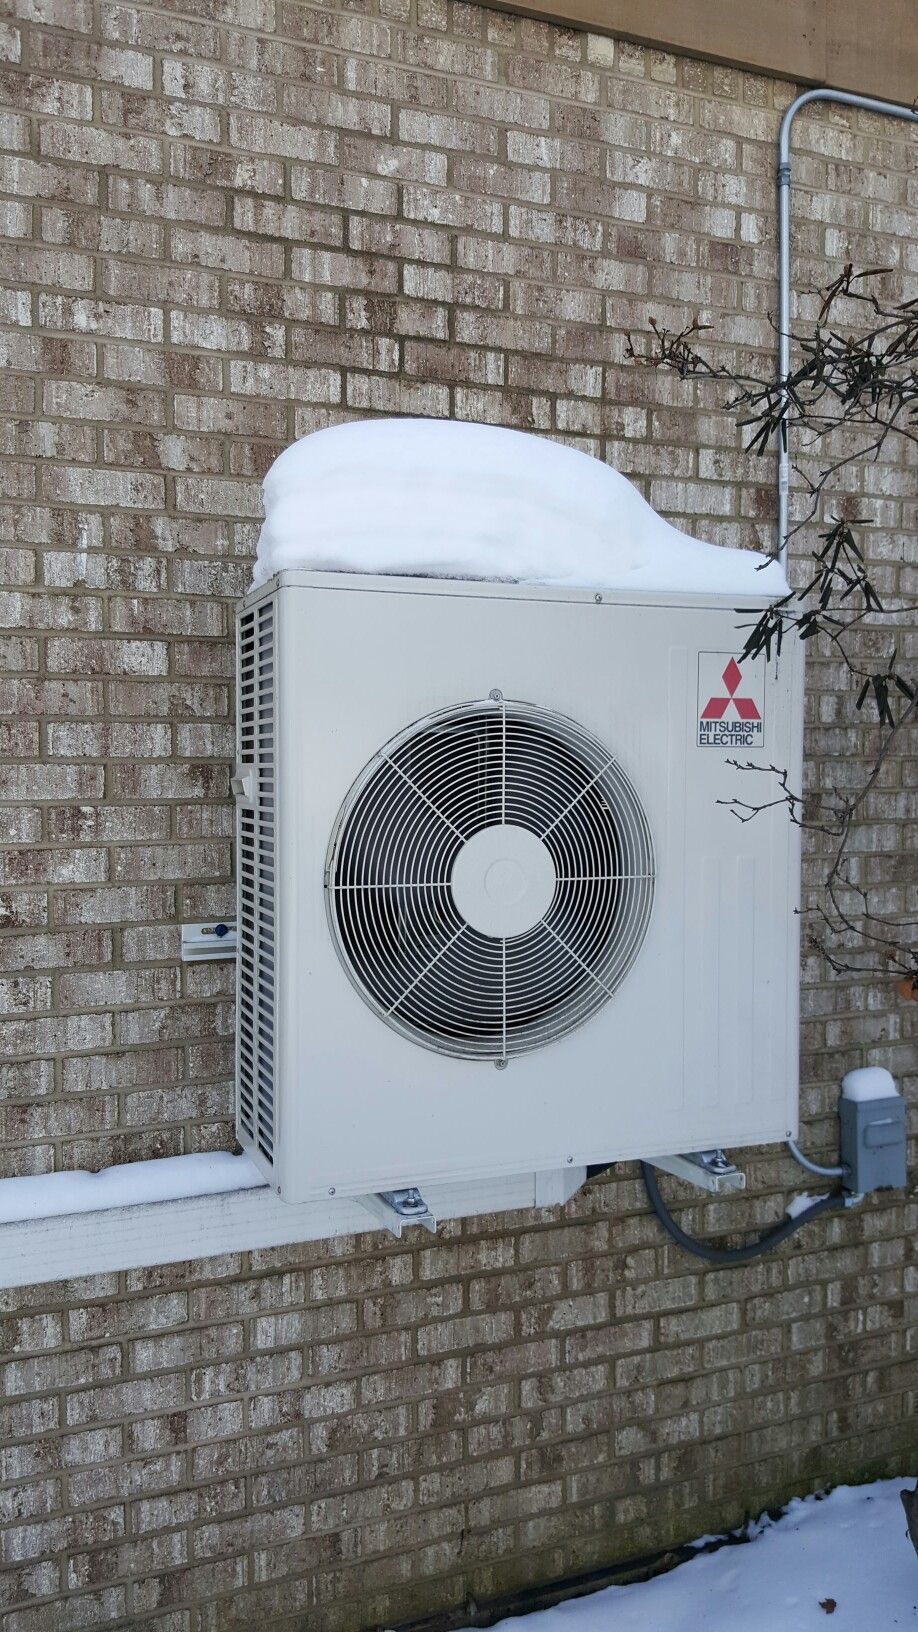 Mitsubishi MUZFH18NA HyperHeat 11 heat pump installed